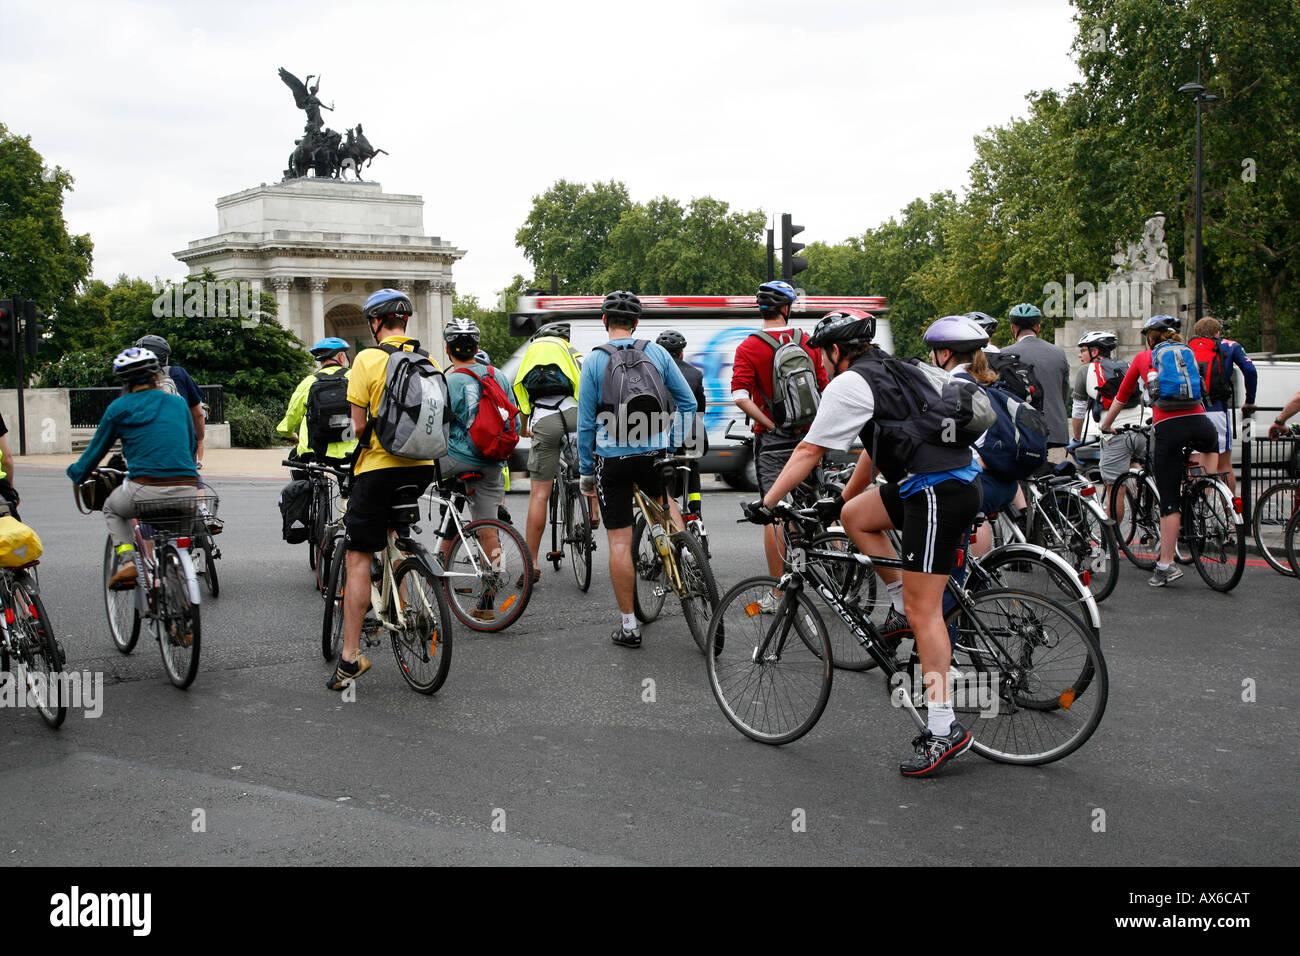 Cyclists at Hyde Park Corner, Belgravia, London - Stock Image